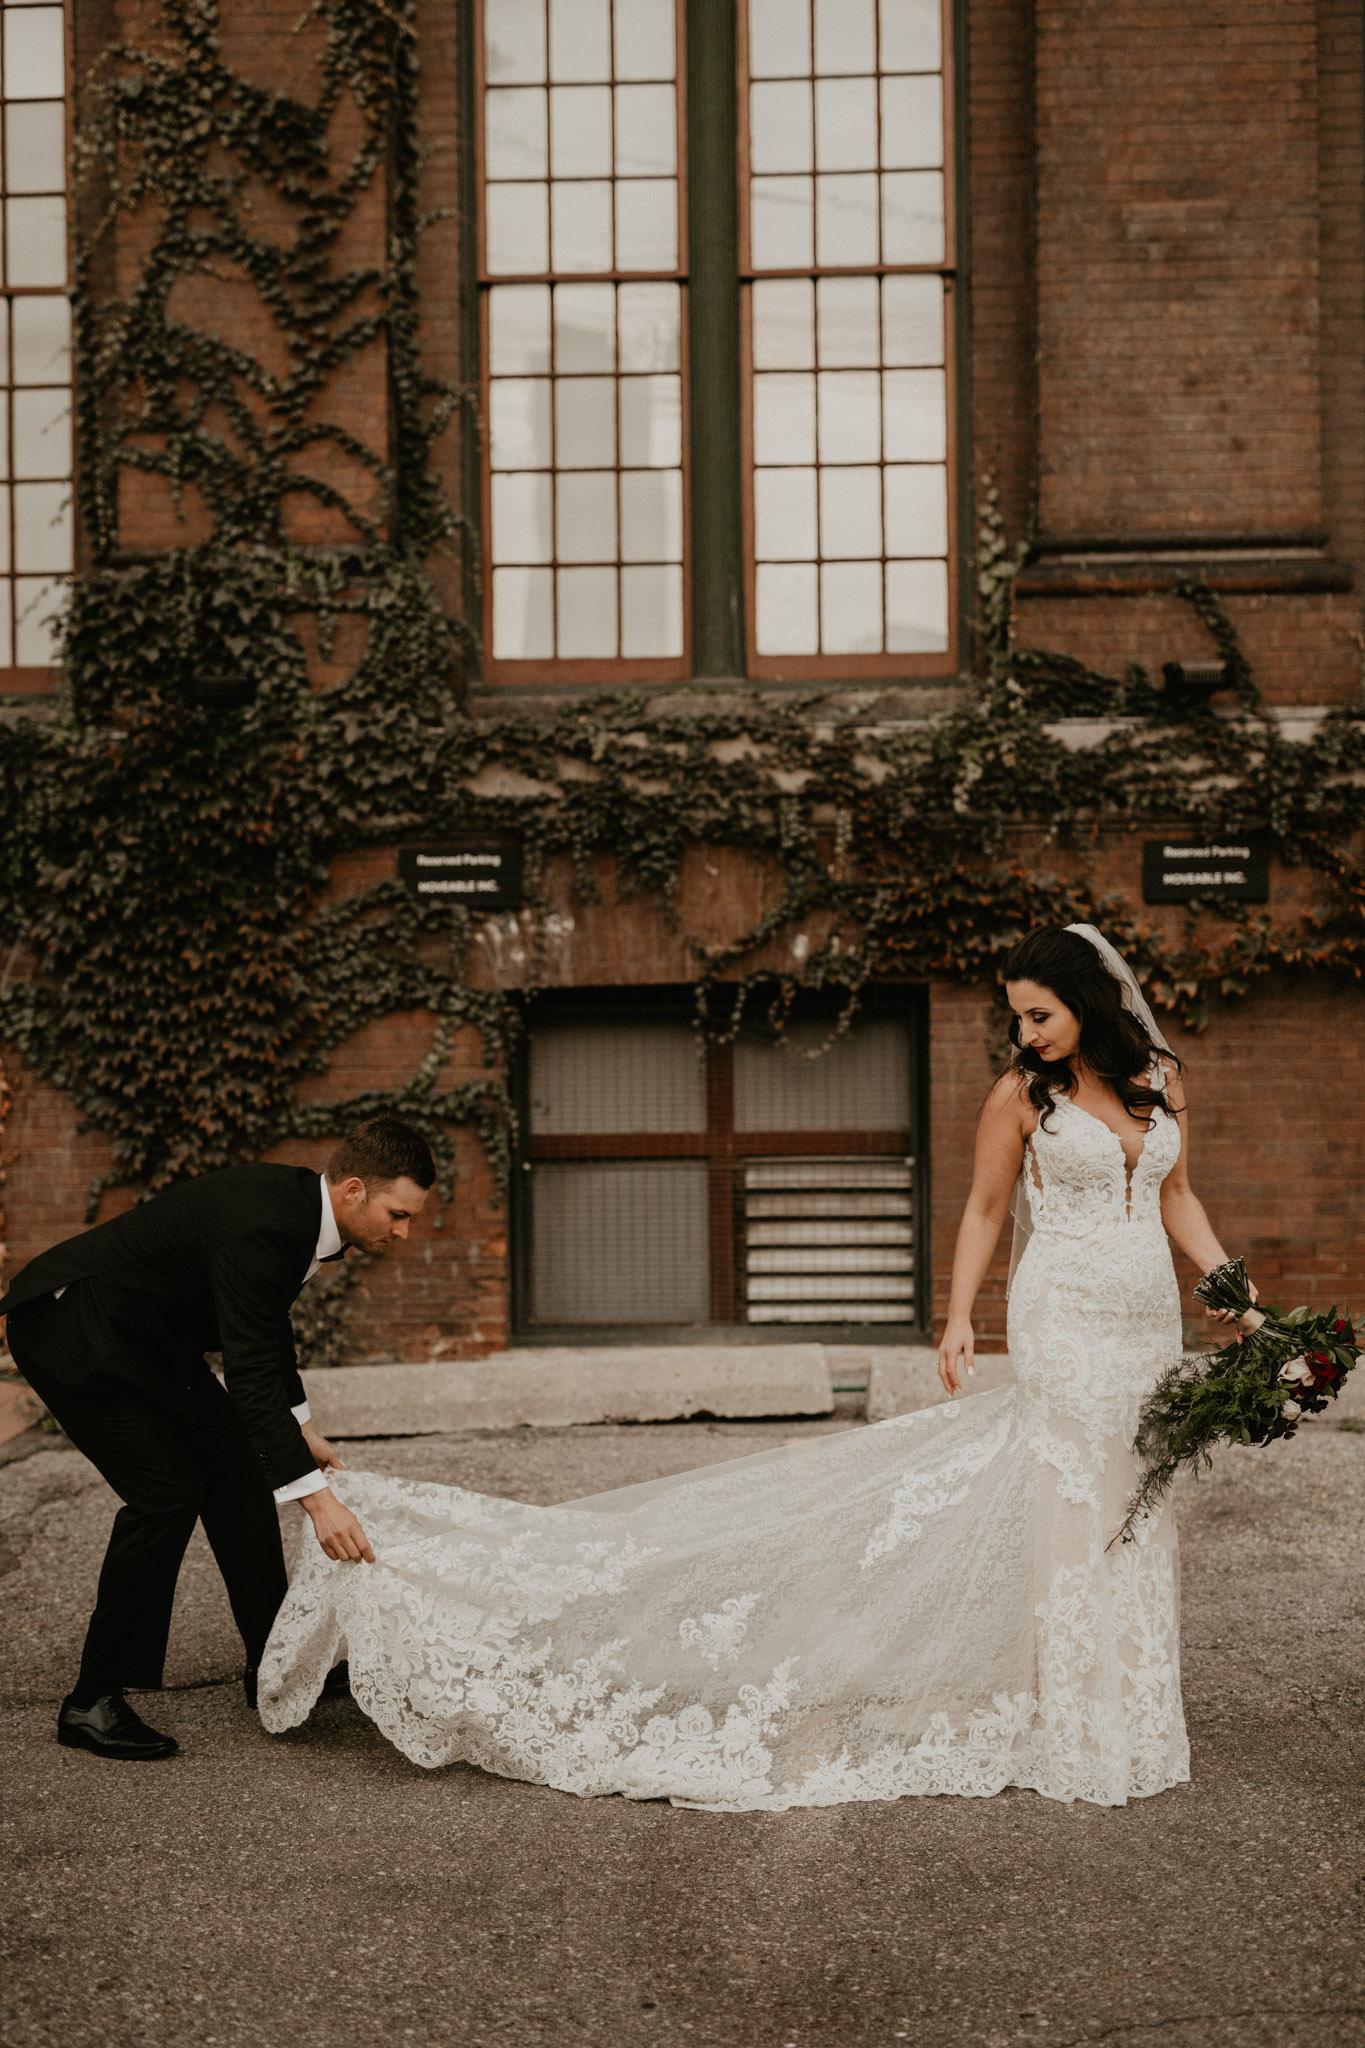 Liberty Village Wedding - groom fixes brides train